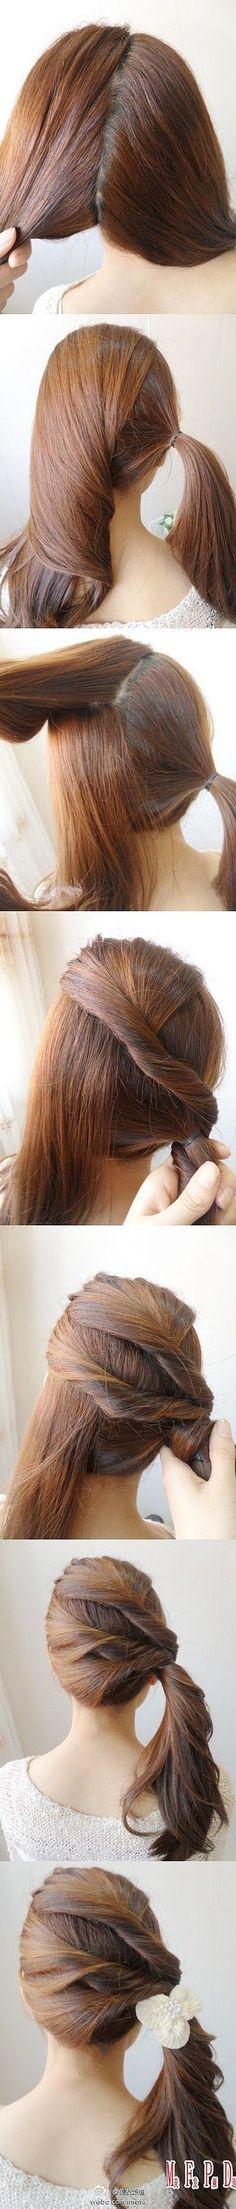 Cute style for long hair